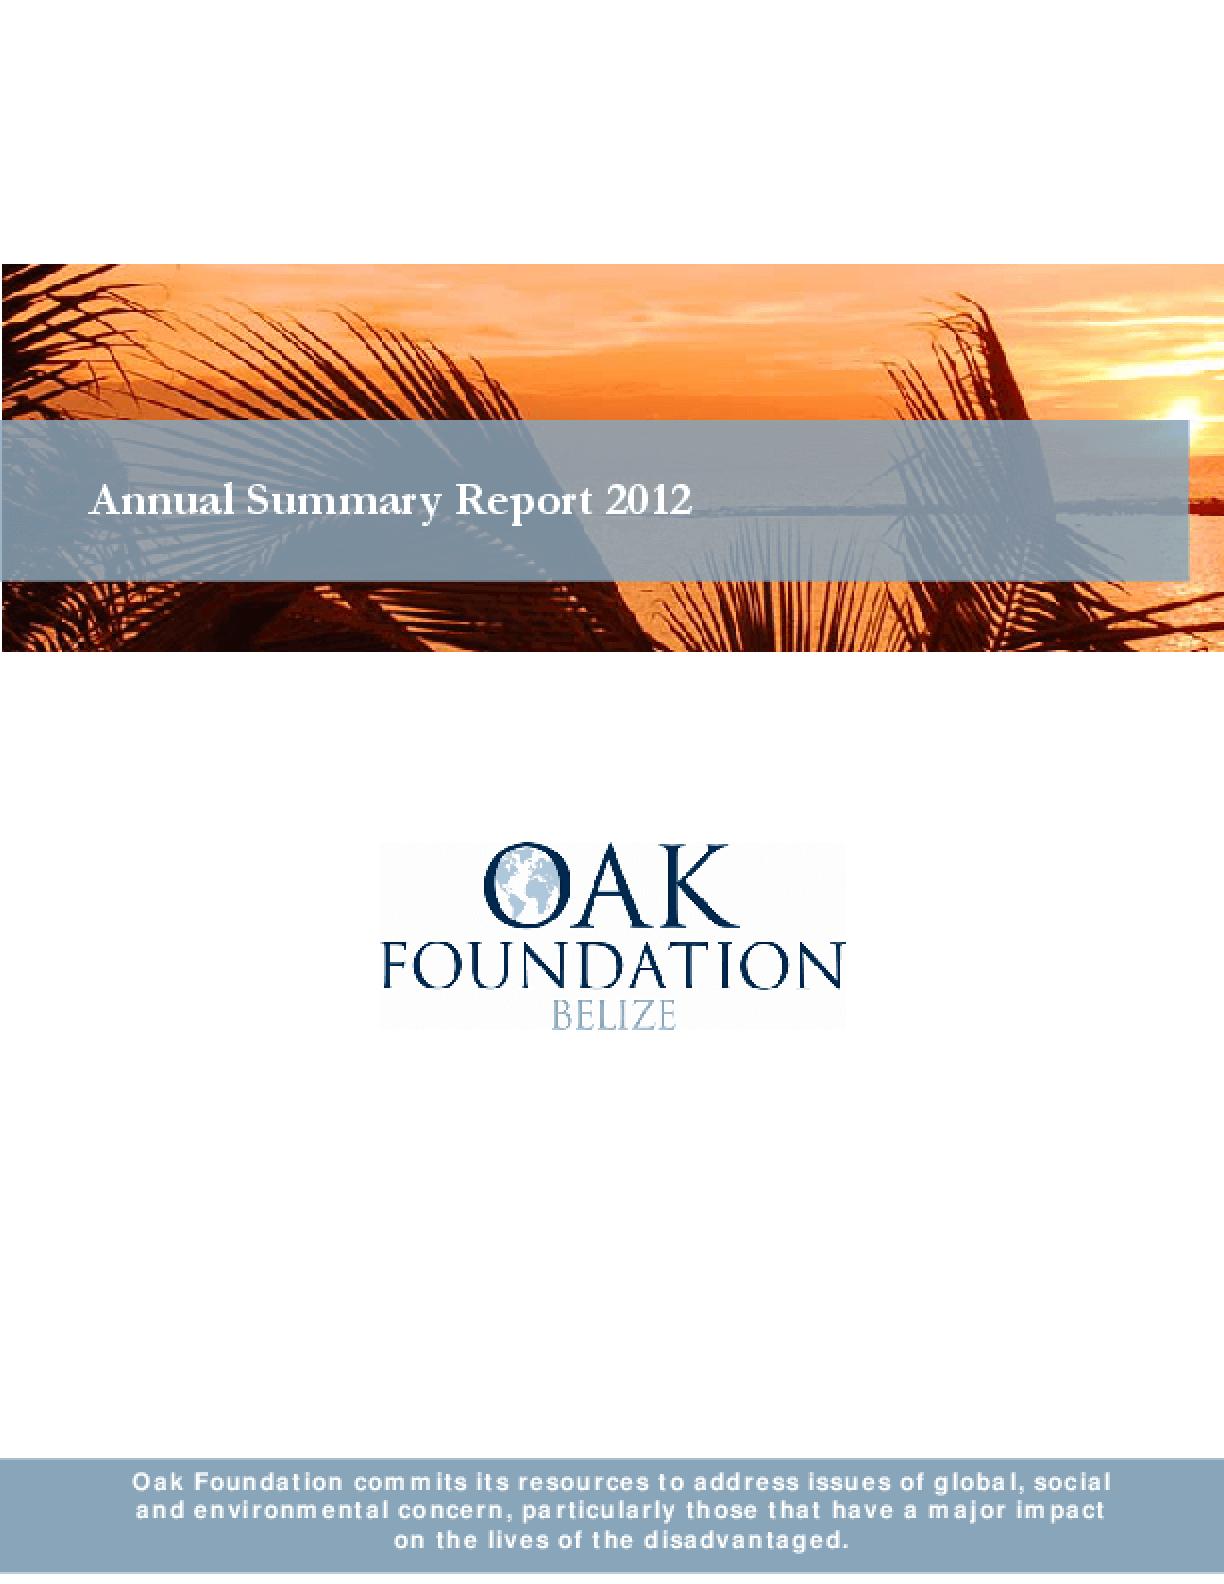 Oak Foundation Belize: Annual Summary Report 2012